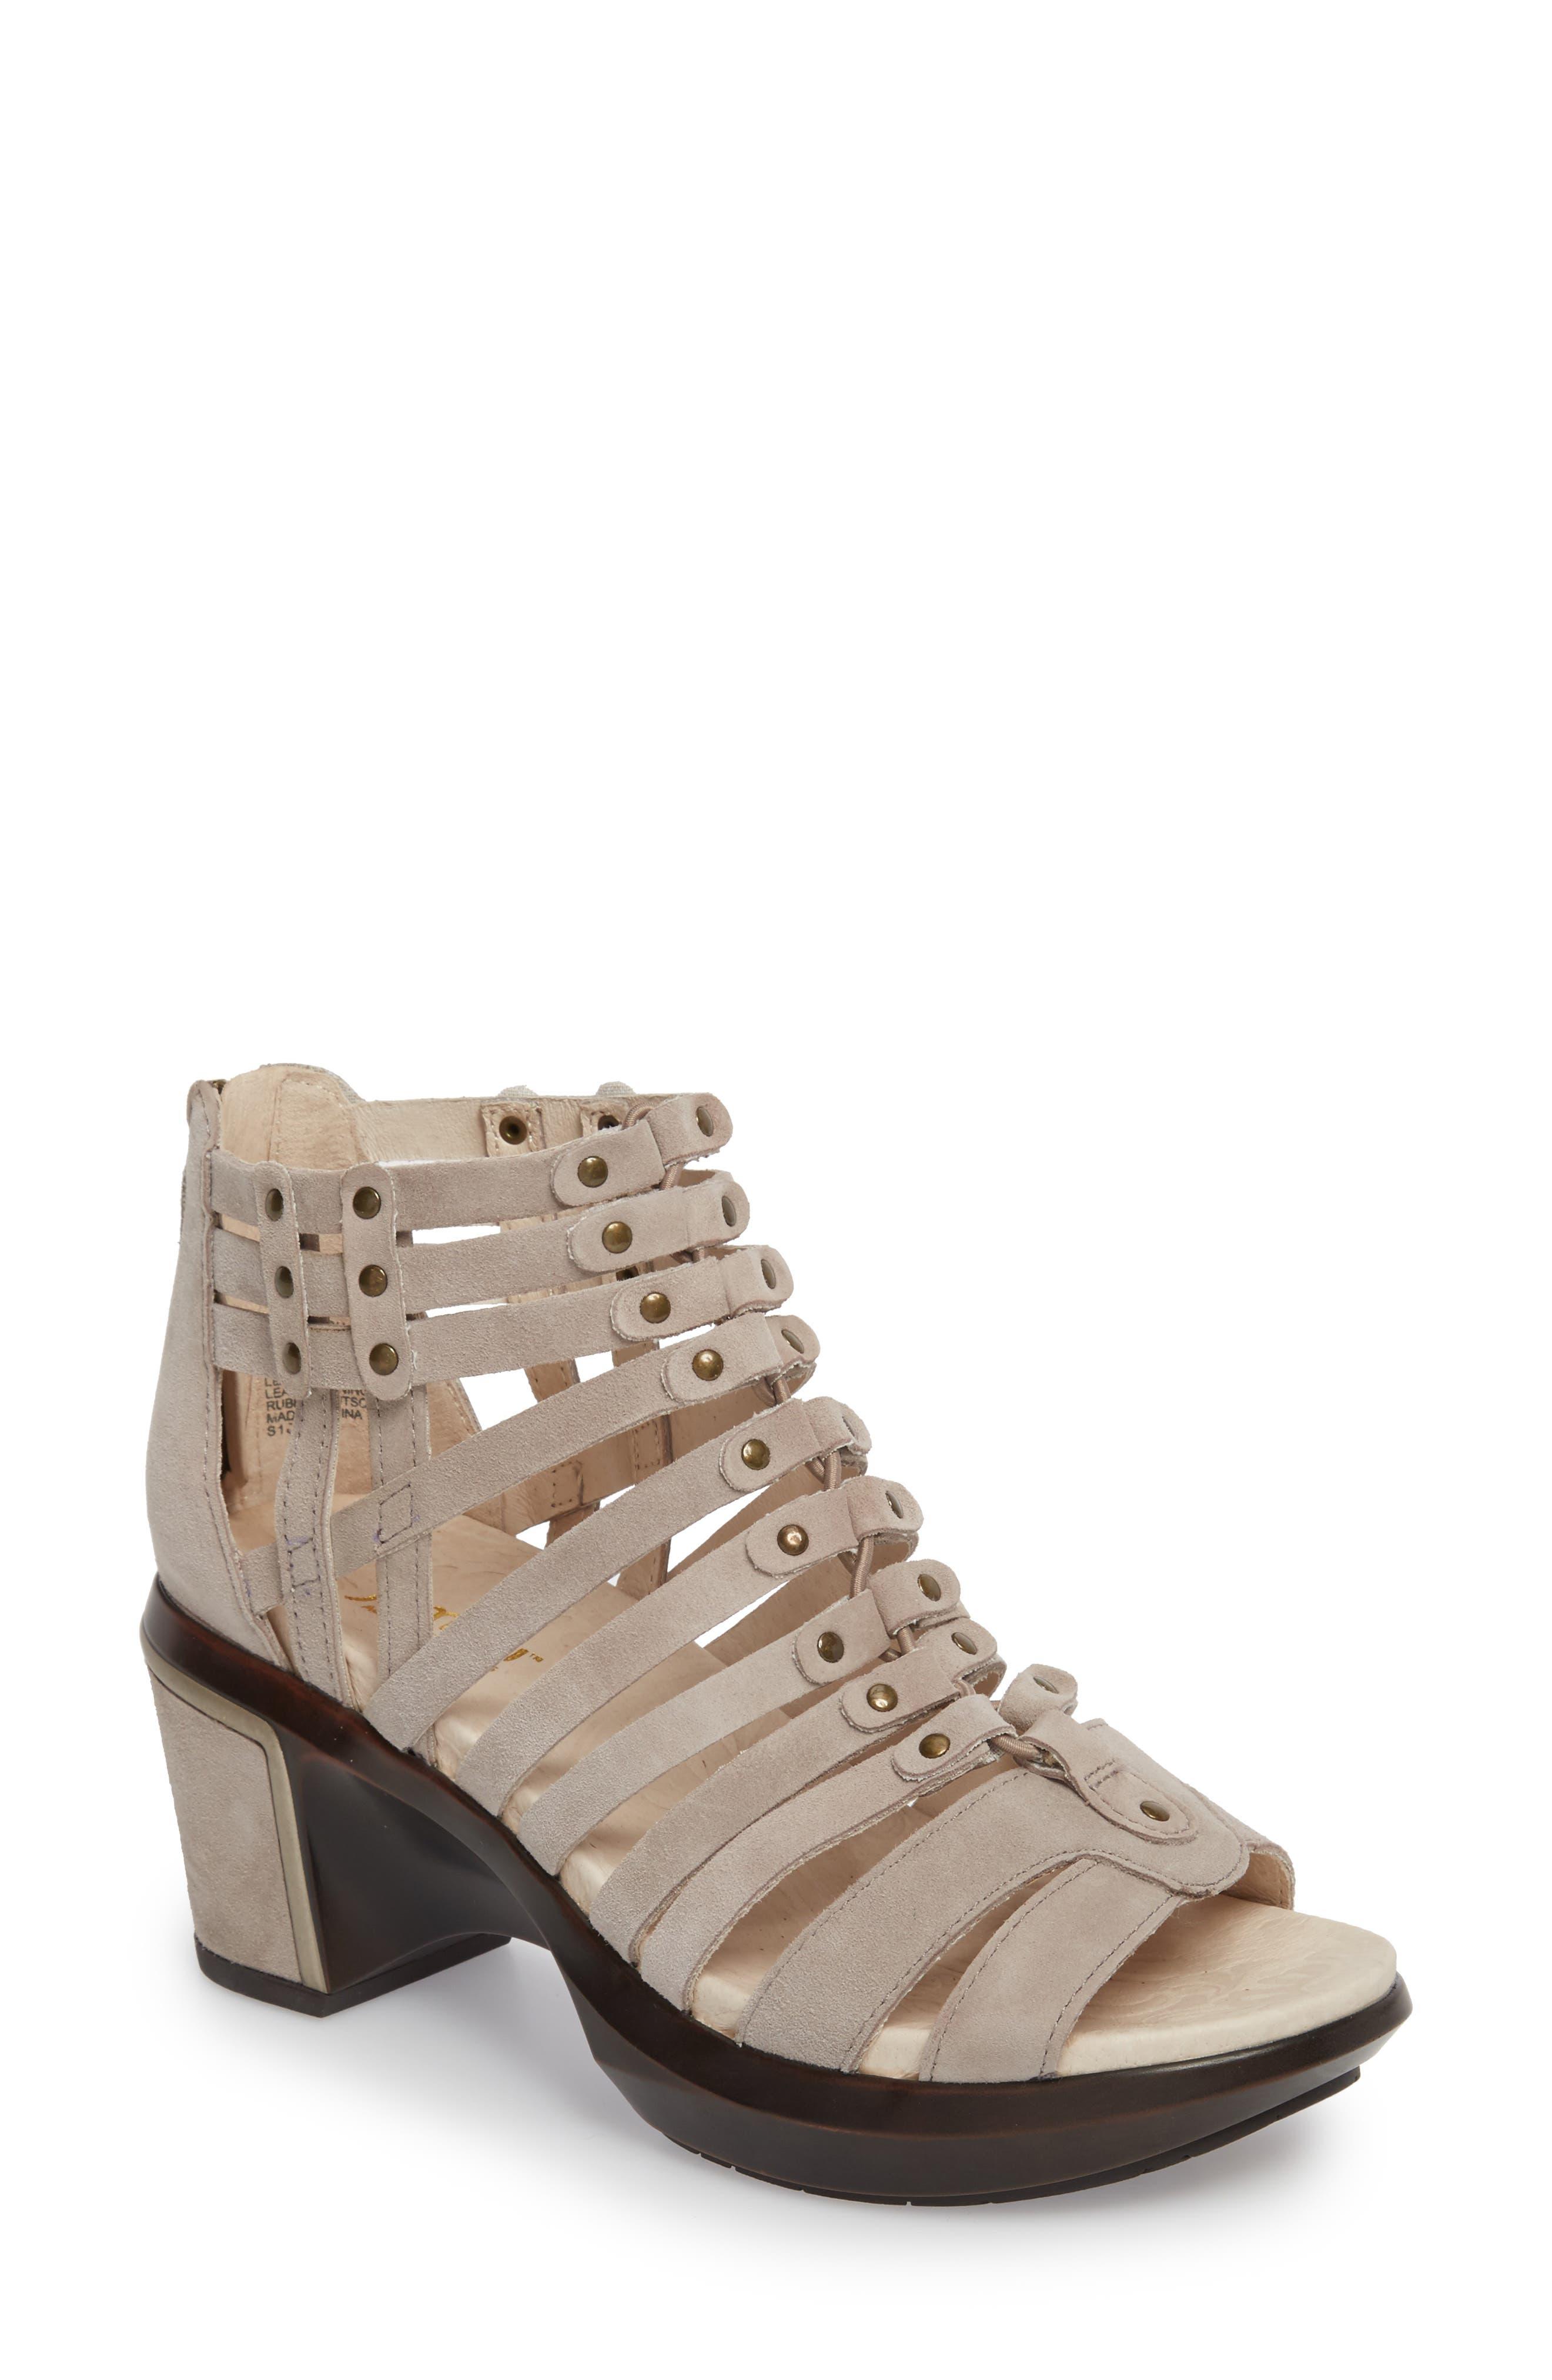 Sugar Too Gladiator Sandal,                         Main,                         color, TAUPE SUEDE